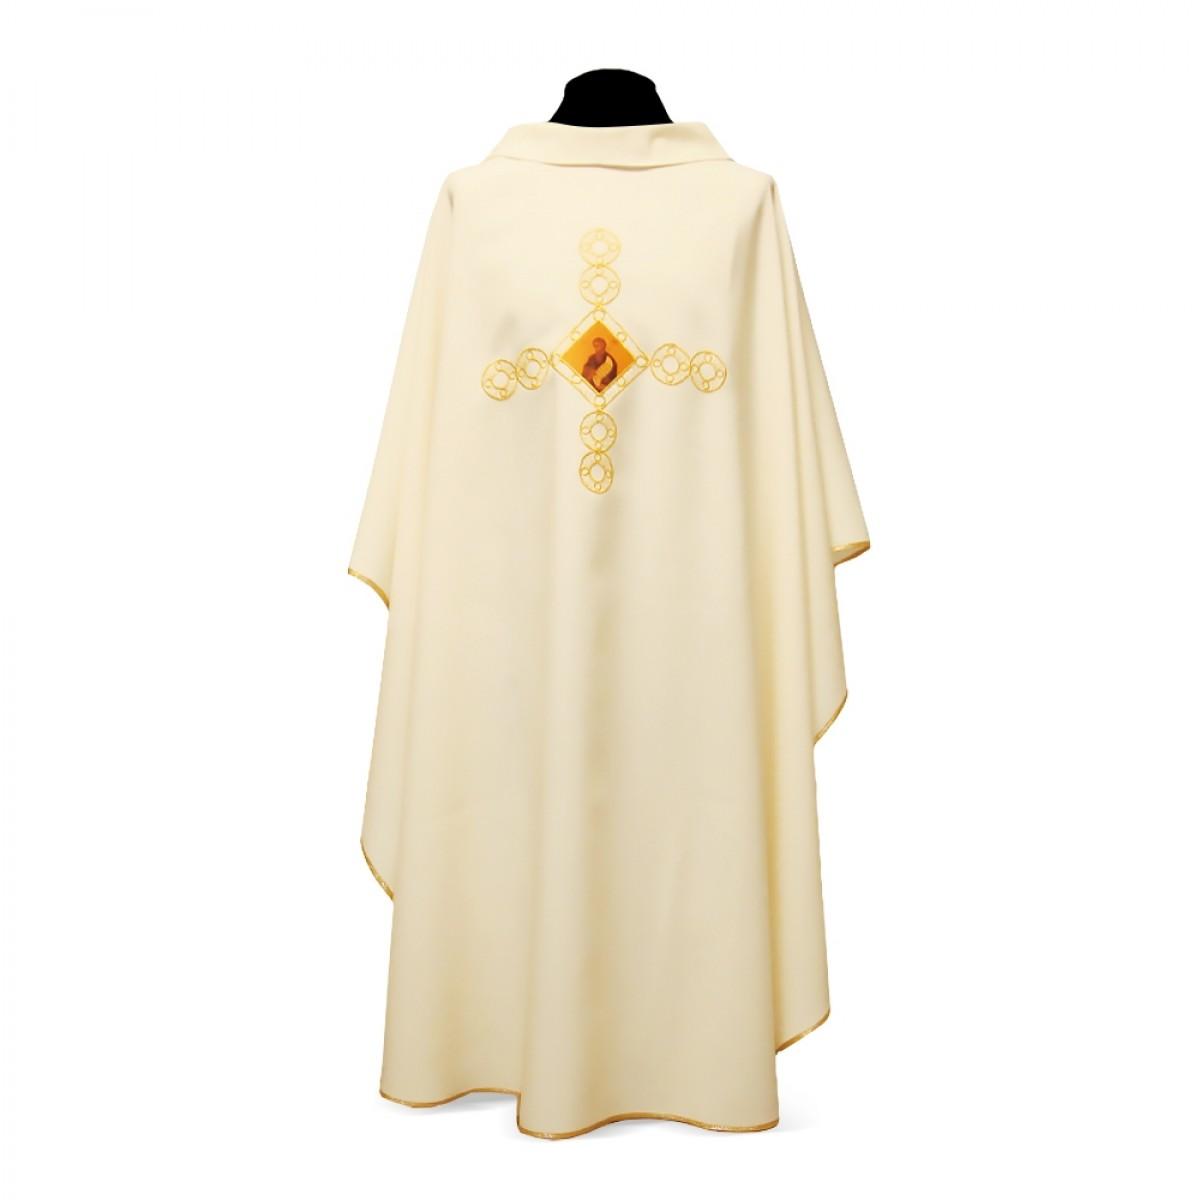 Ingresso S.E. Mons. Santo Marcianò